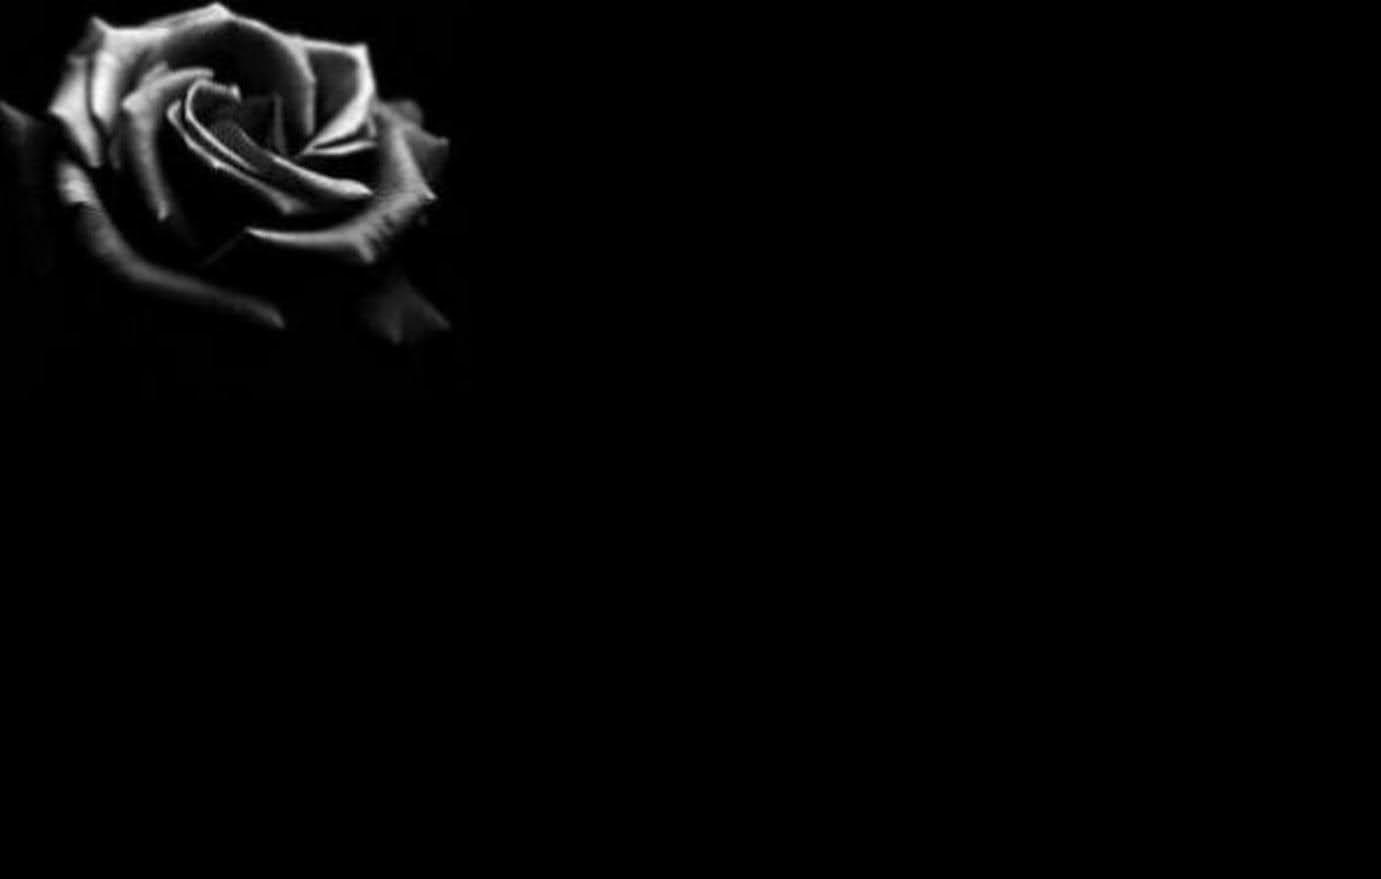 Black rose symbolism wiki fandom powered by wikia hd wallpapers black rose symbolism wiki fandom powered by wikia biocorpaavc Choice Image